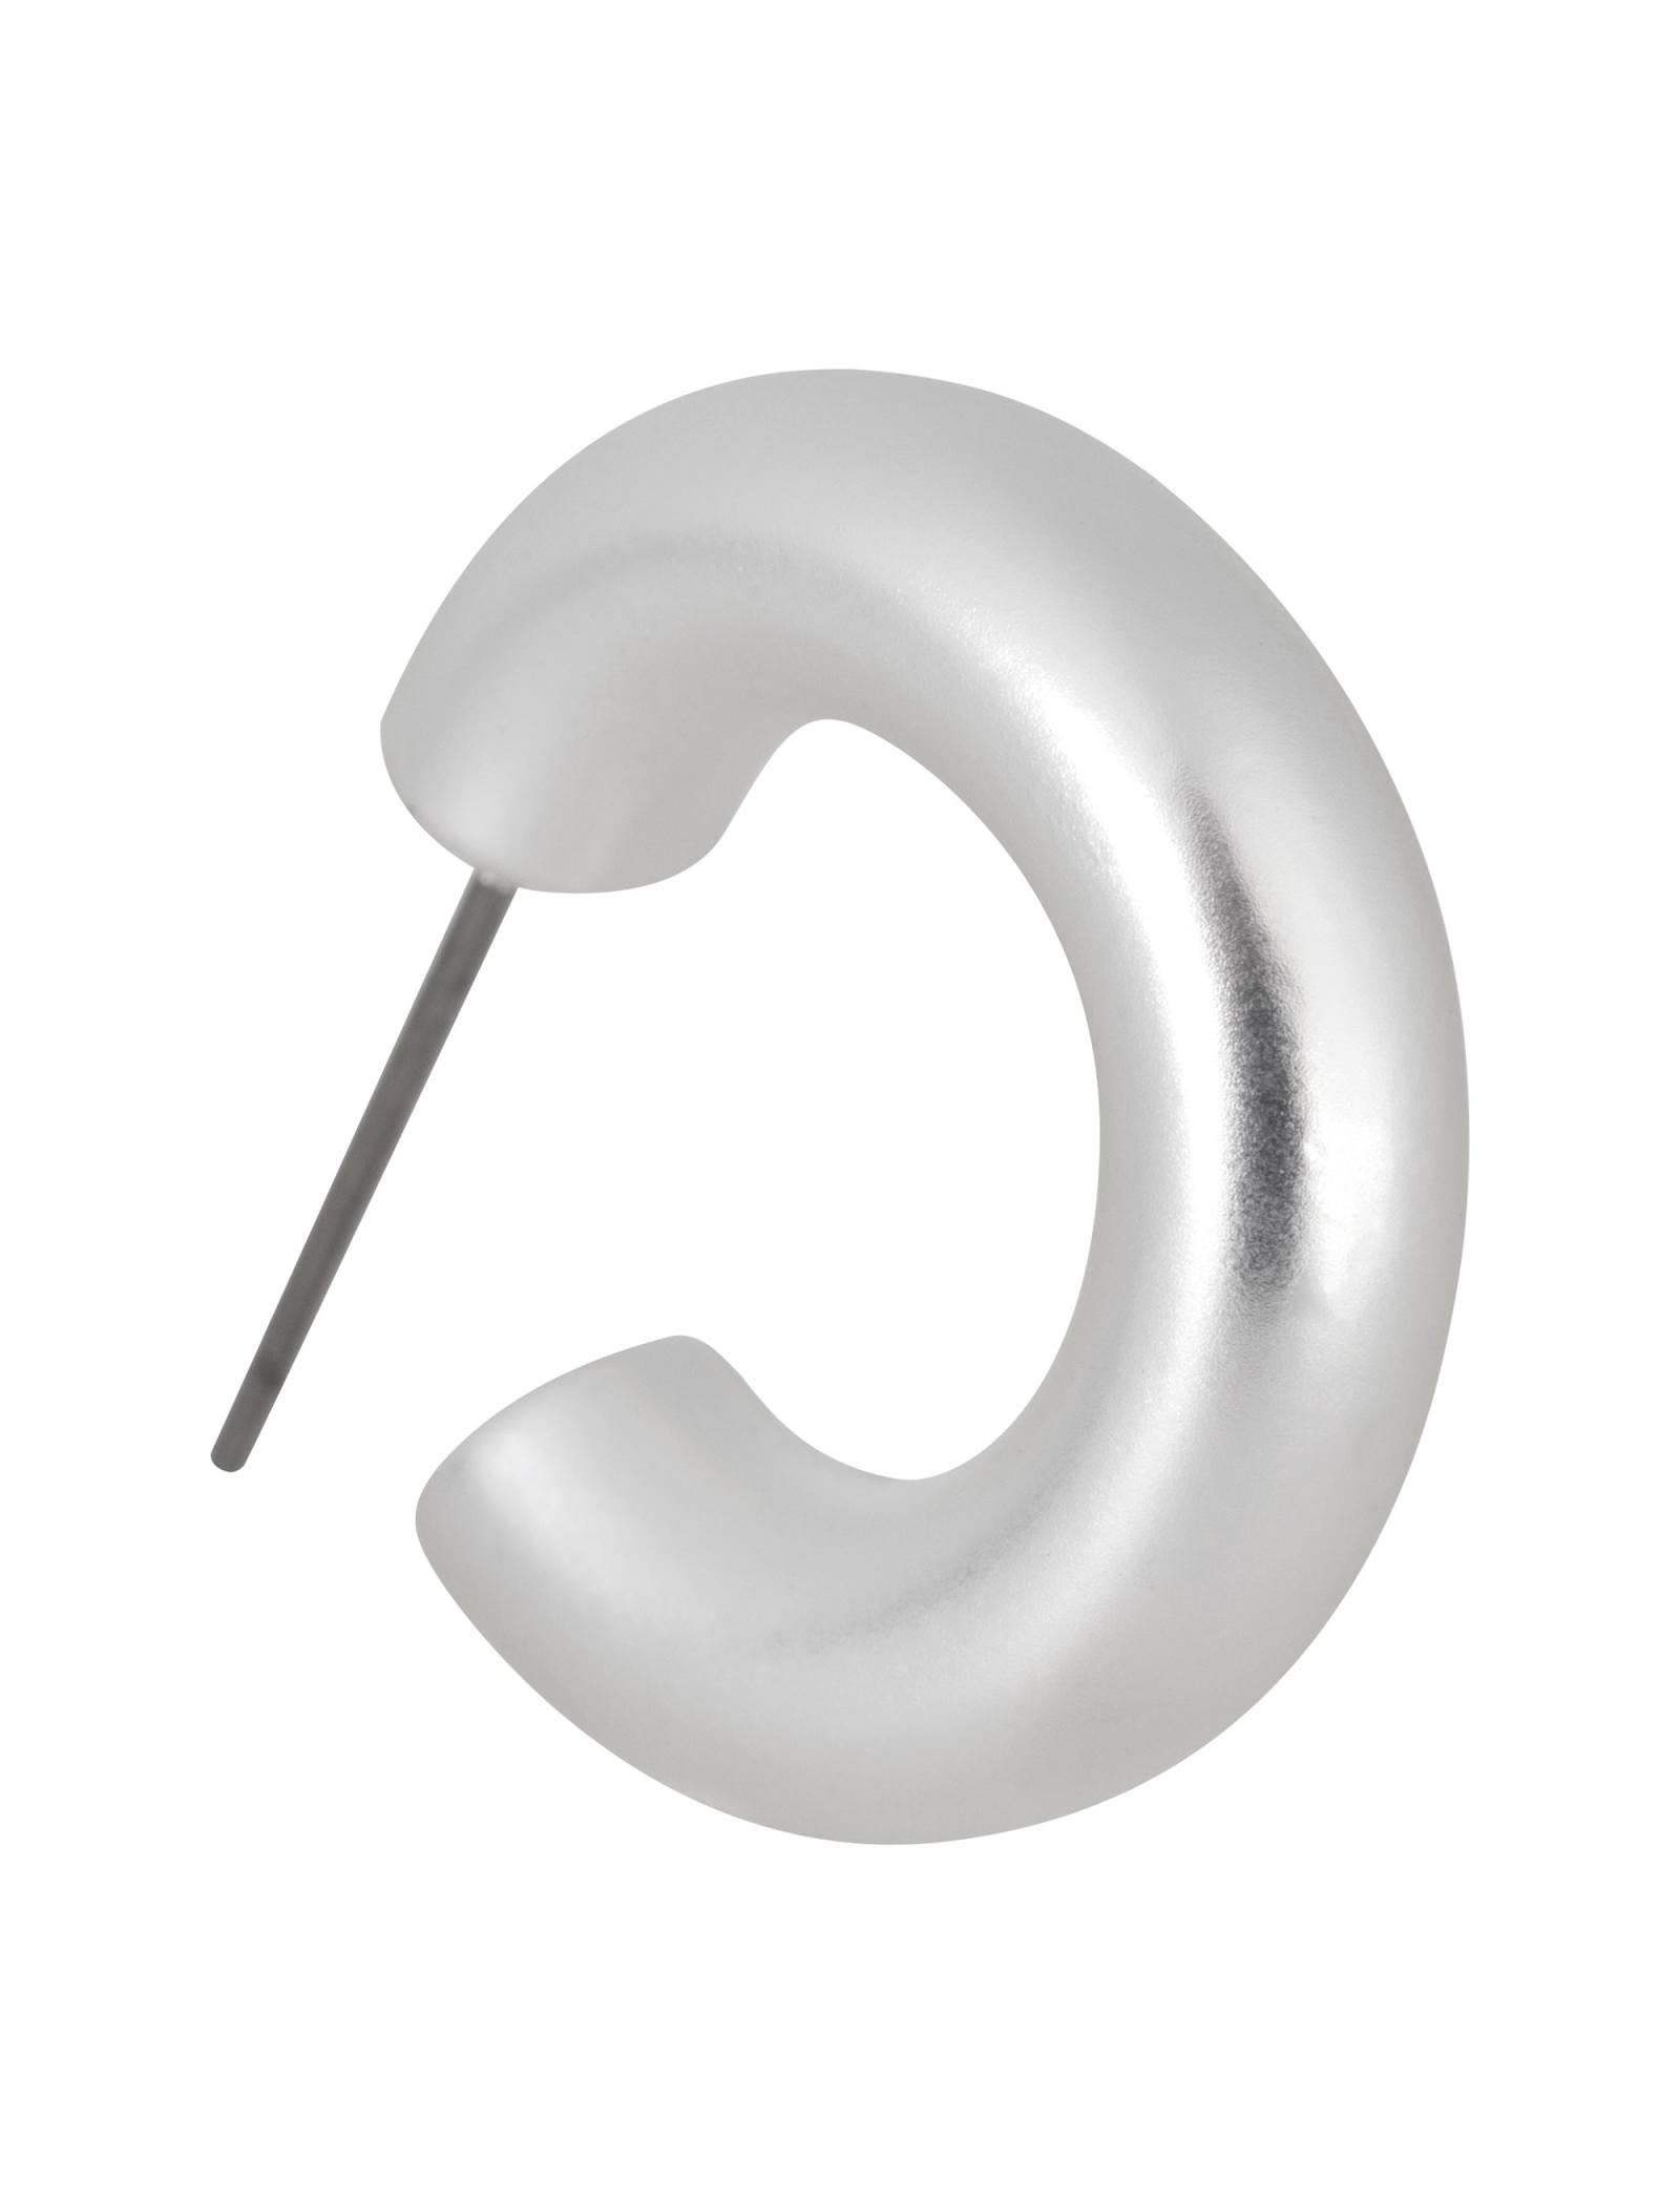 گوشواره حلقه ای زنانه - پی سز تک سایز - نقره اي - 2